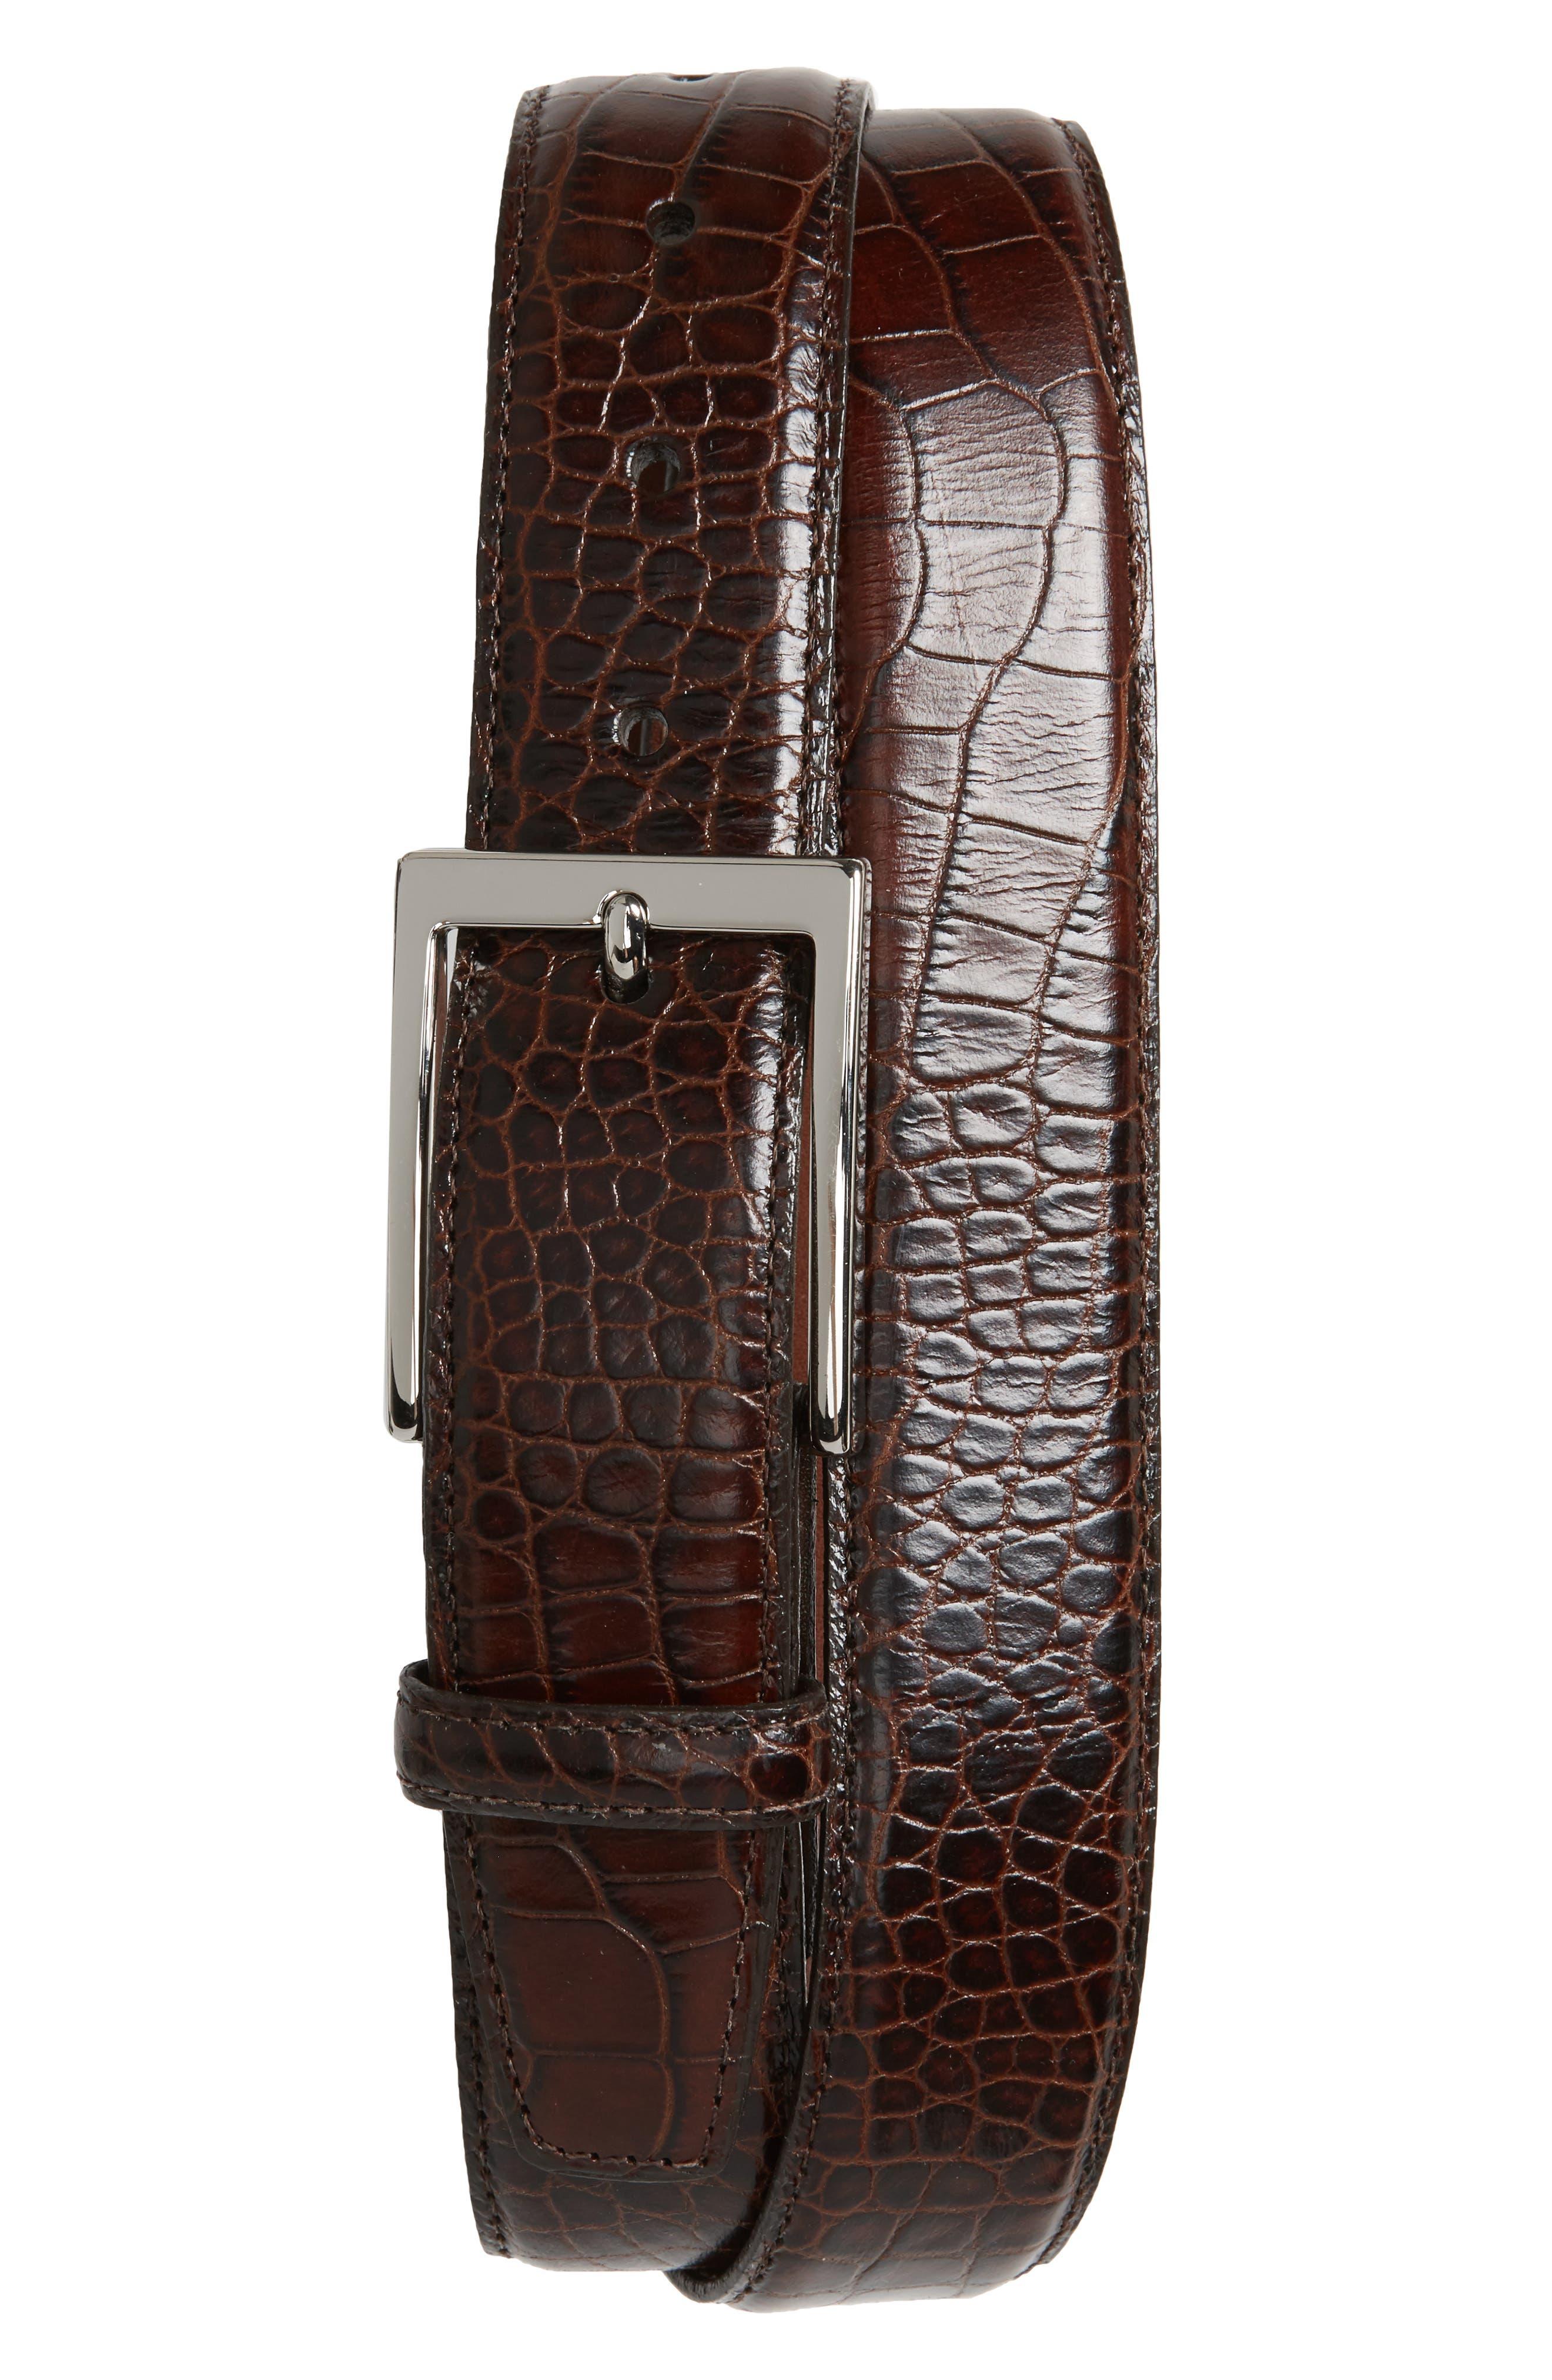 Torino Belts Gator Grain Embossed Leather Belt, Brown